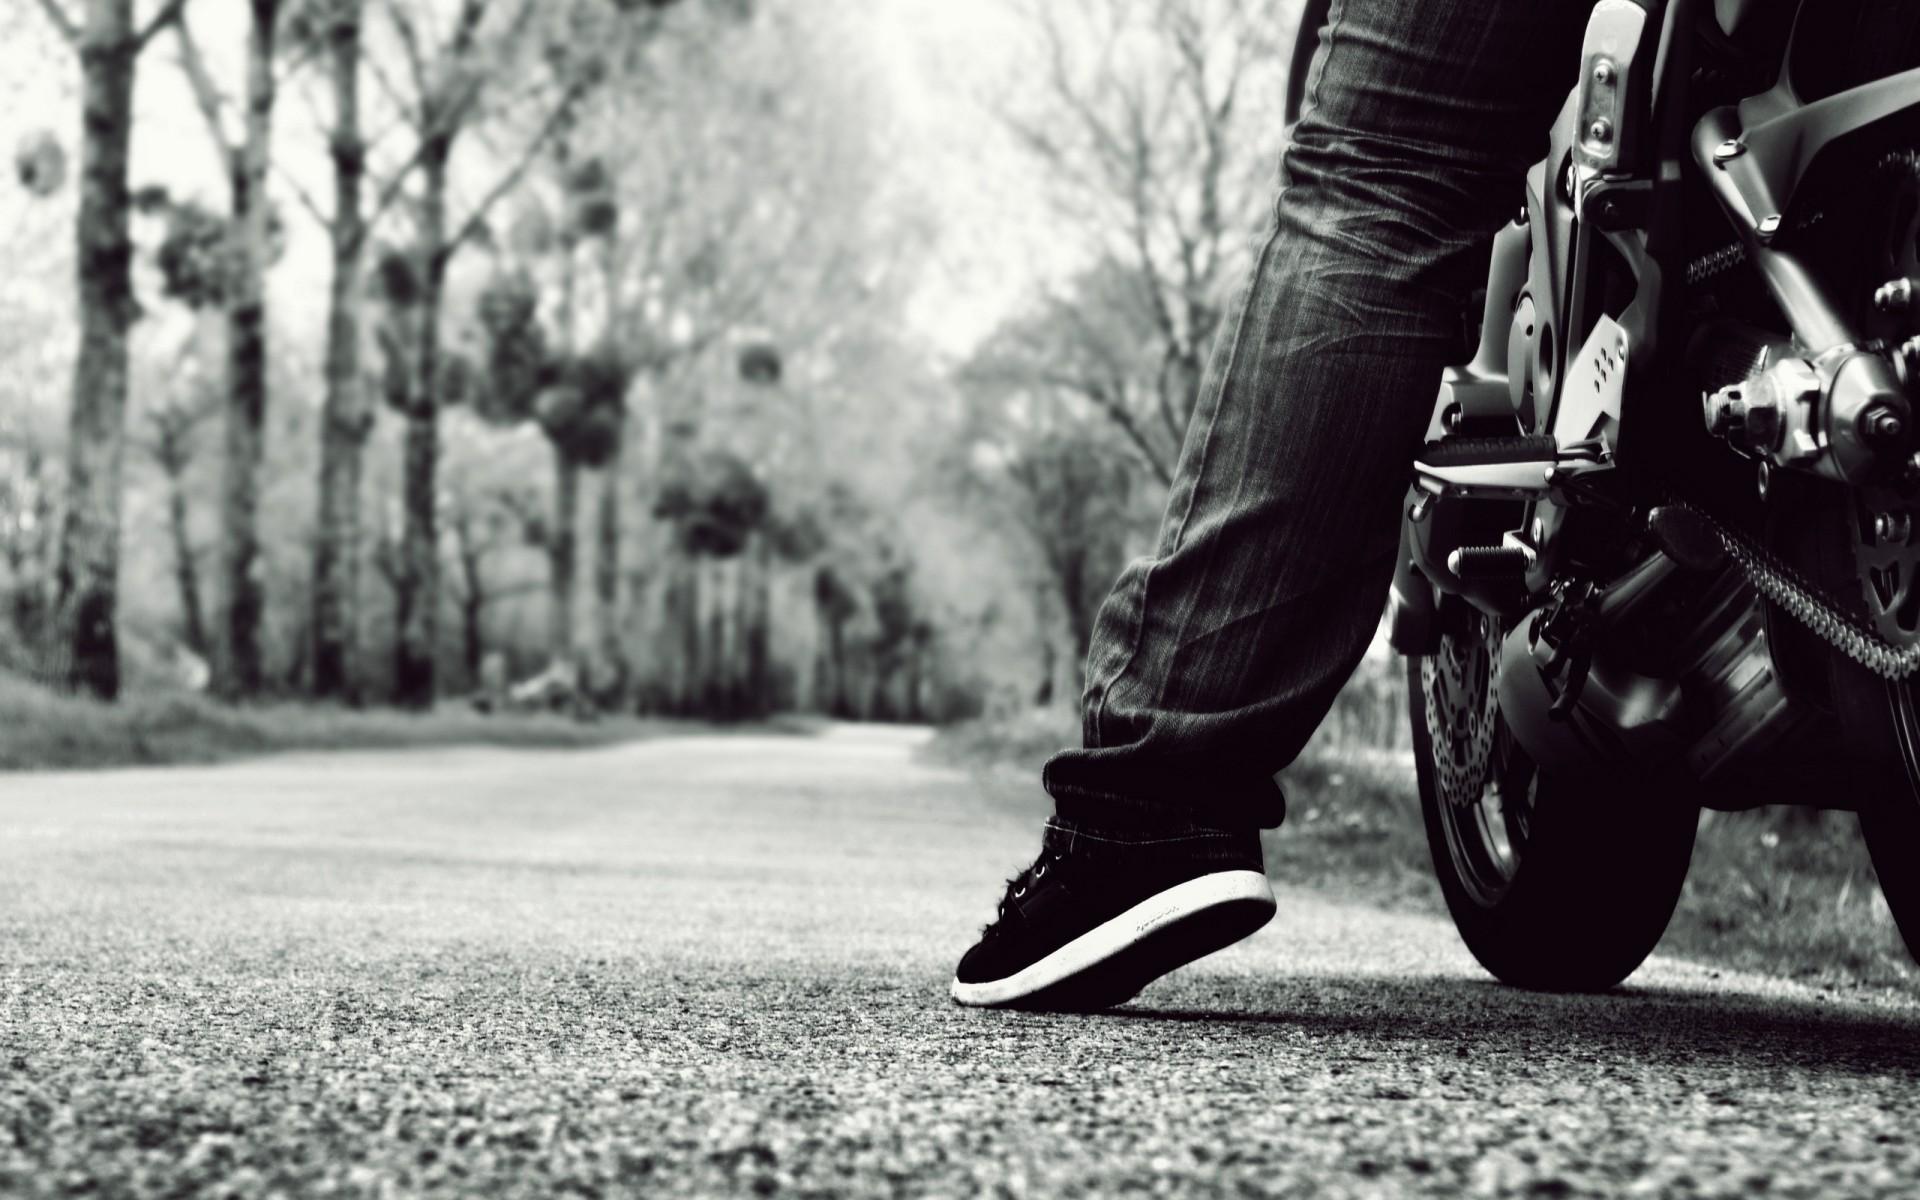 vehicles motorcycles bikes people roads mood black white wallpaper